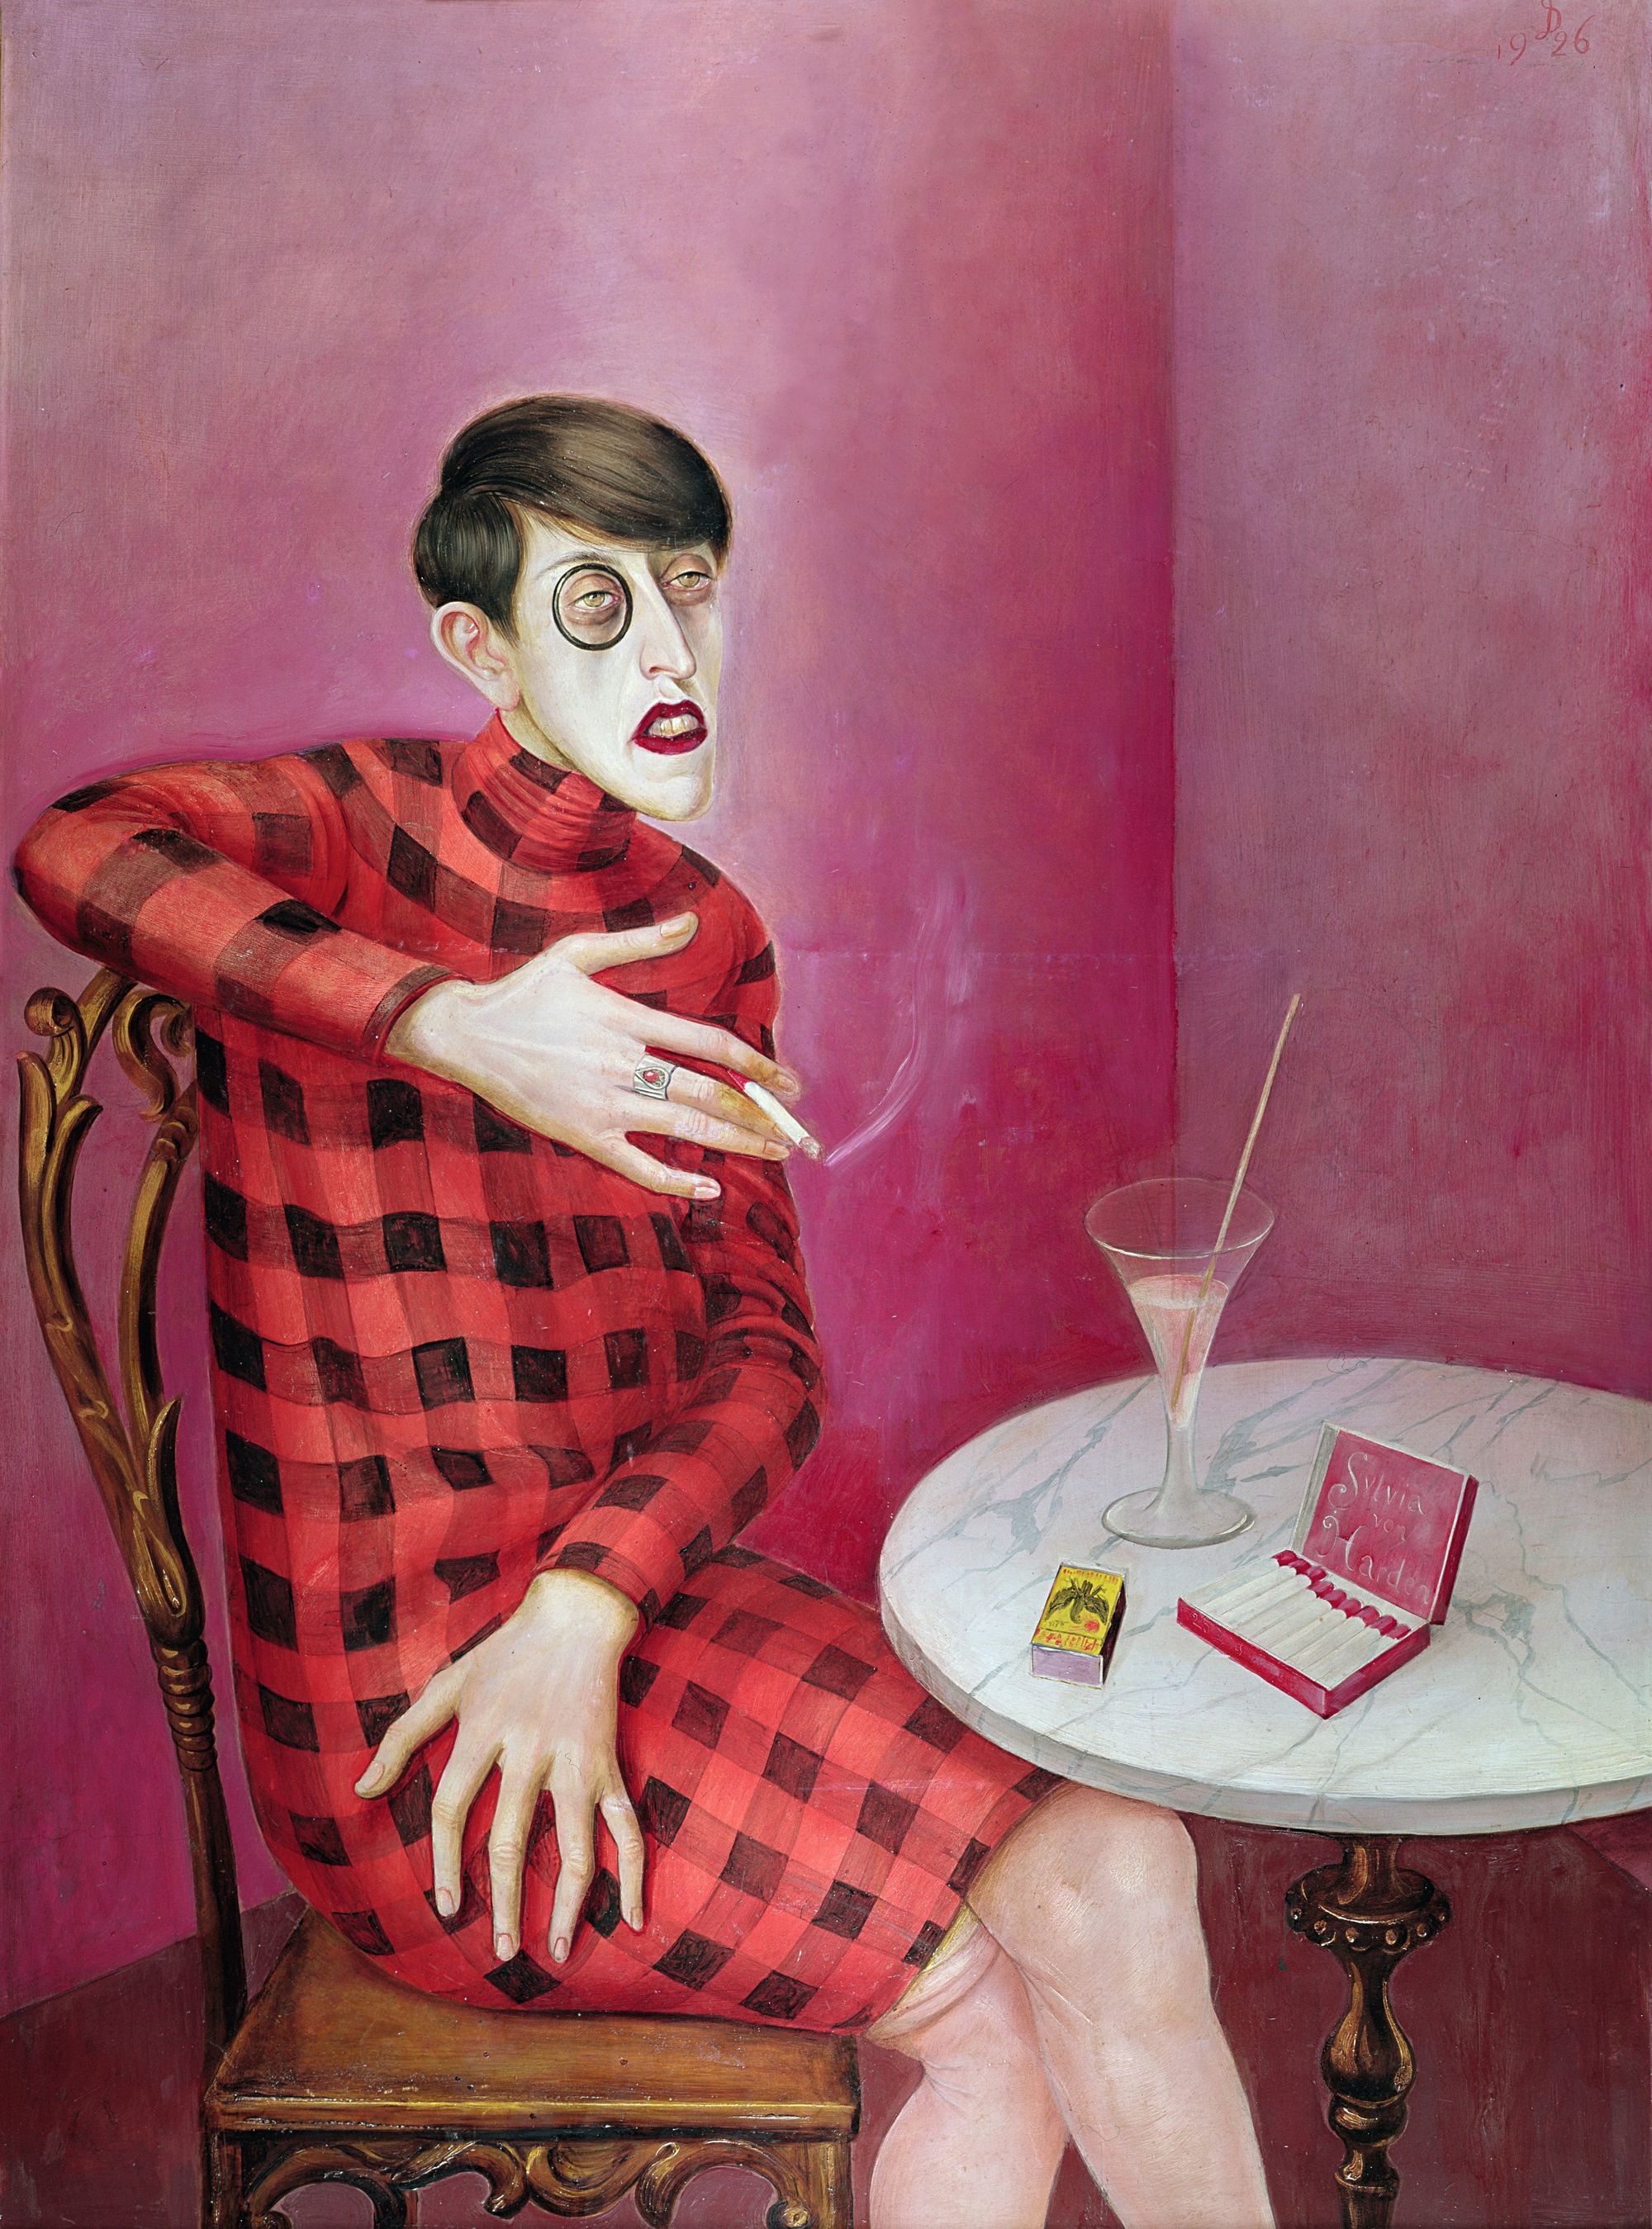 Otto Dix, Portrait de la journaliste Sylvia von Harden,